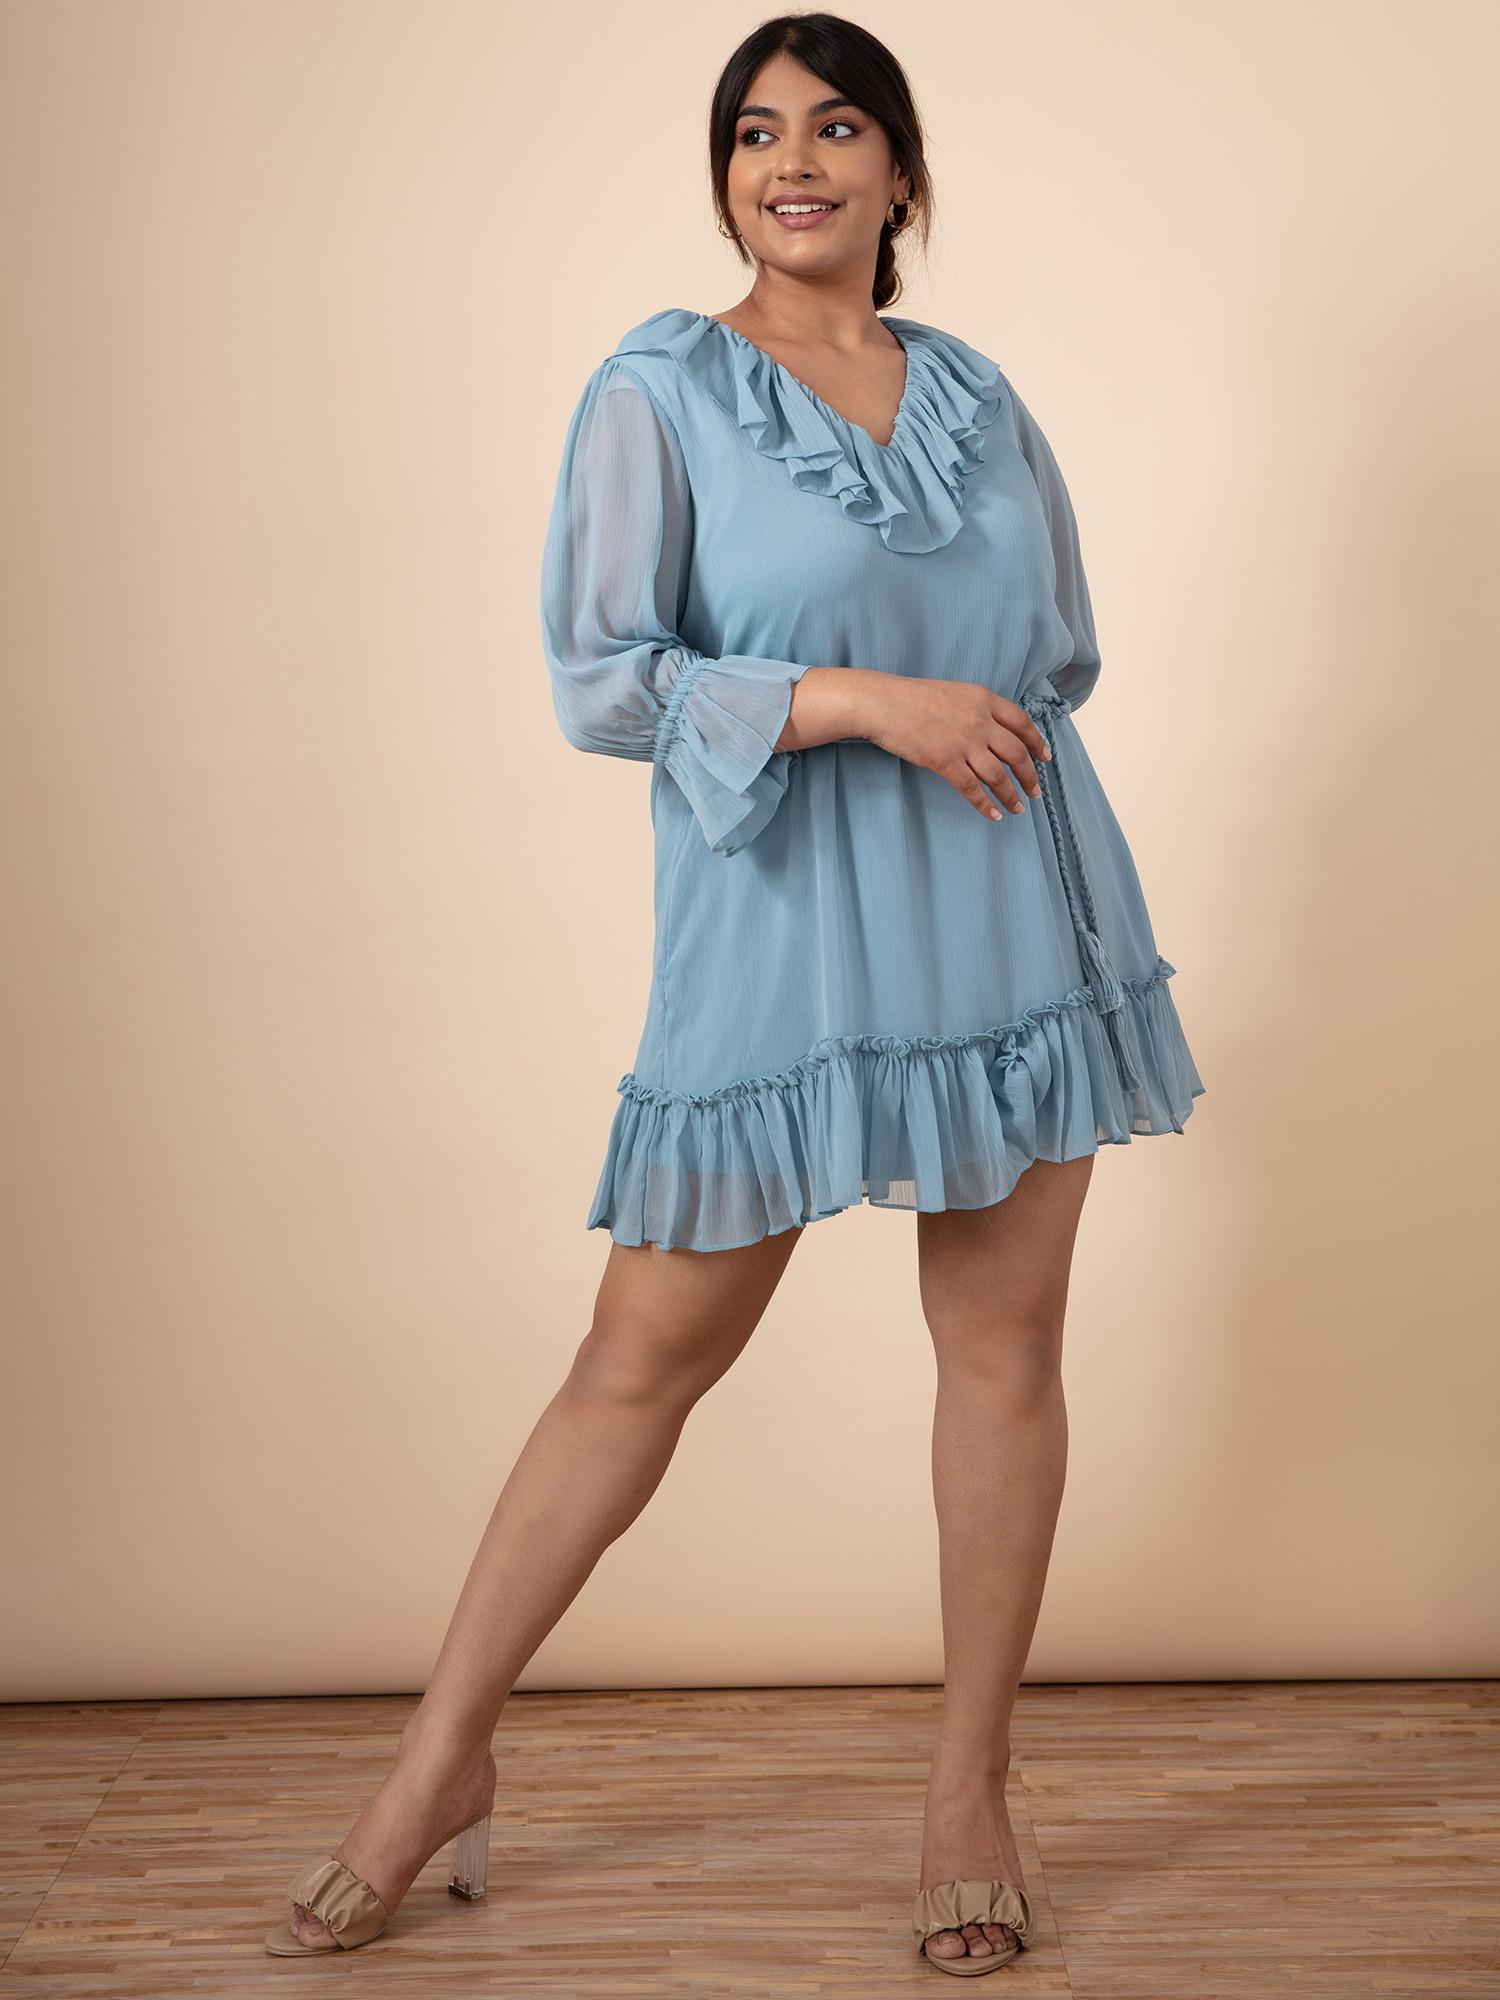 Dresses-Feeling So Summery Dress2